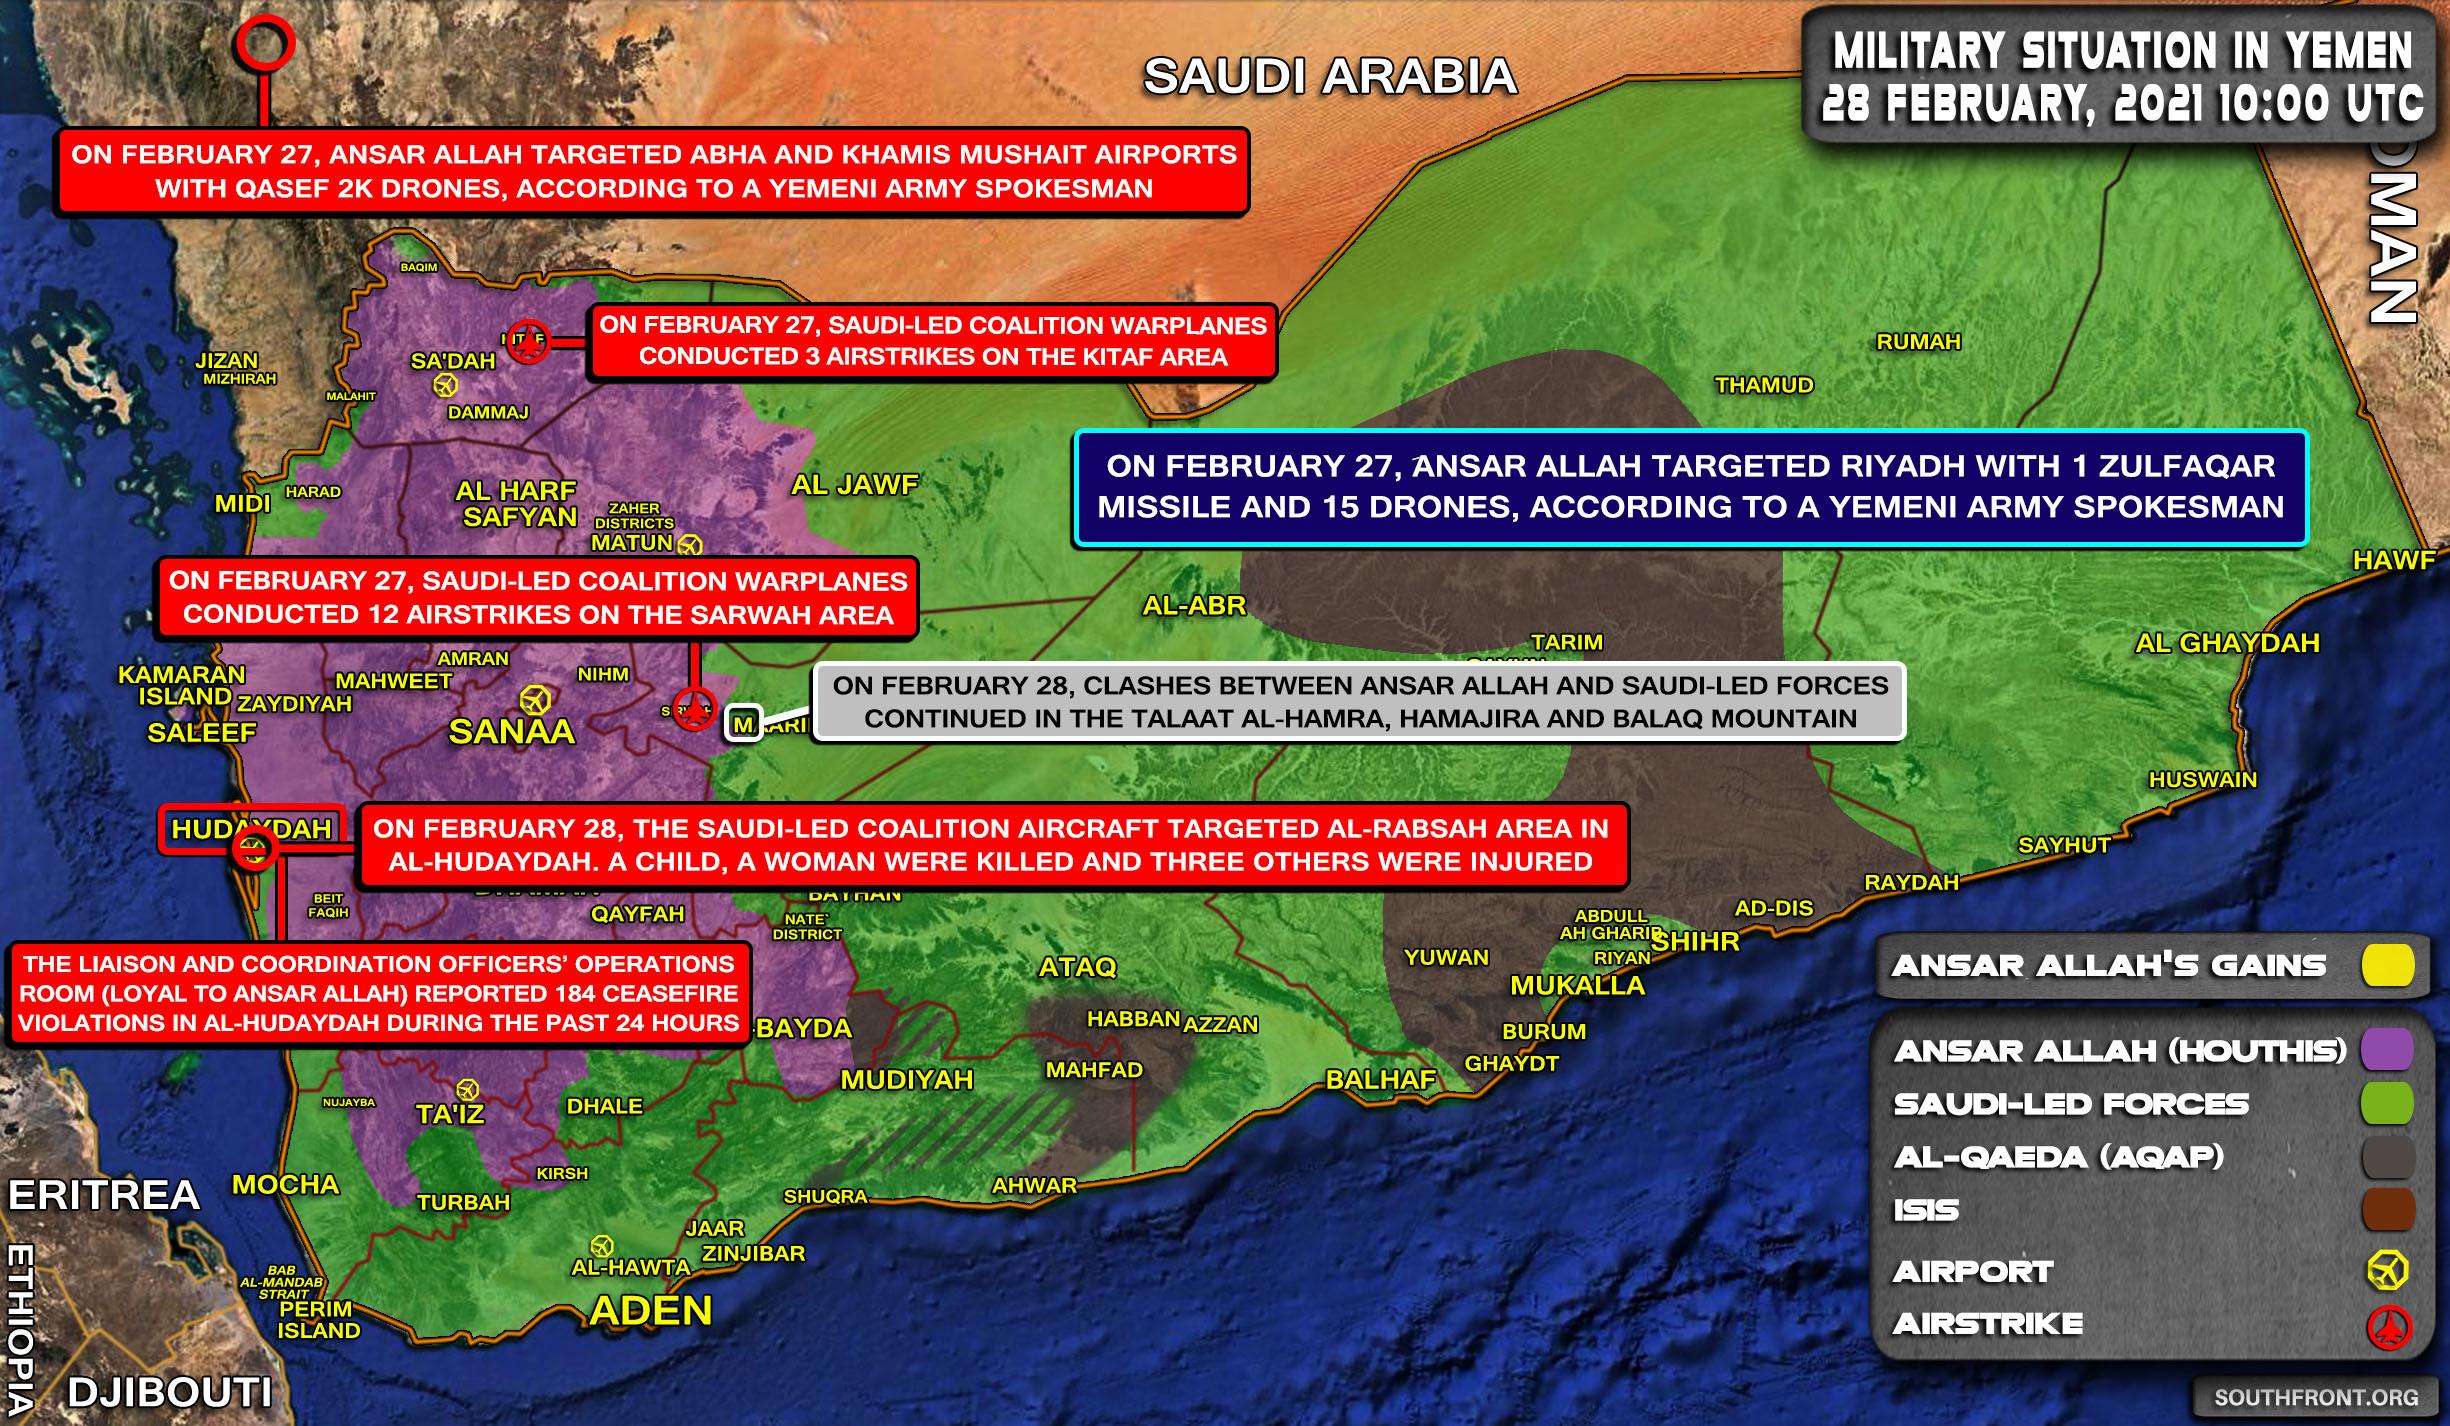 Saudi Arabia Kills Five Civilians, Including Child And Woman In Airstrike On Yemen (Map Update)